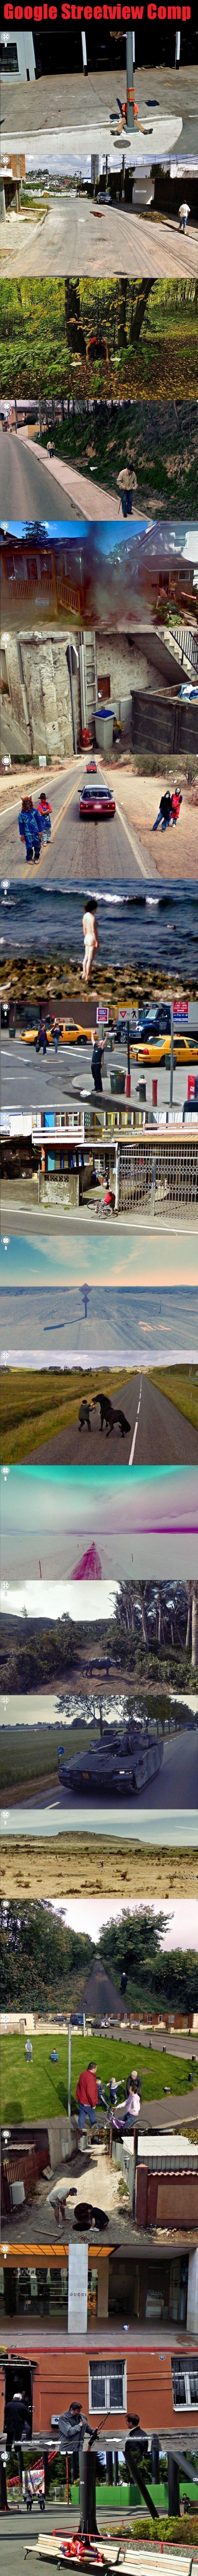 Google Streetview Comp. . Google Streetview Comp